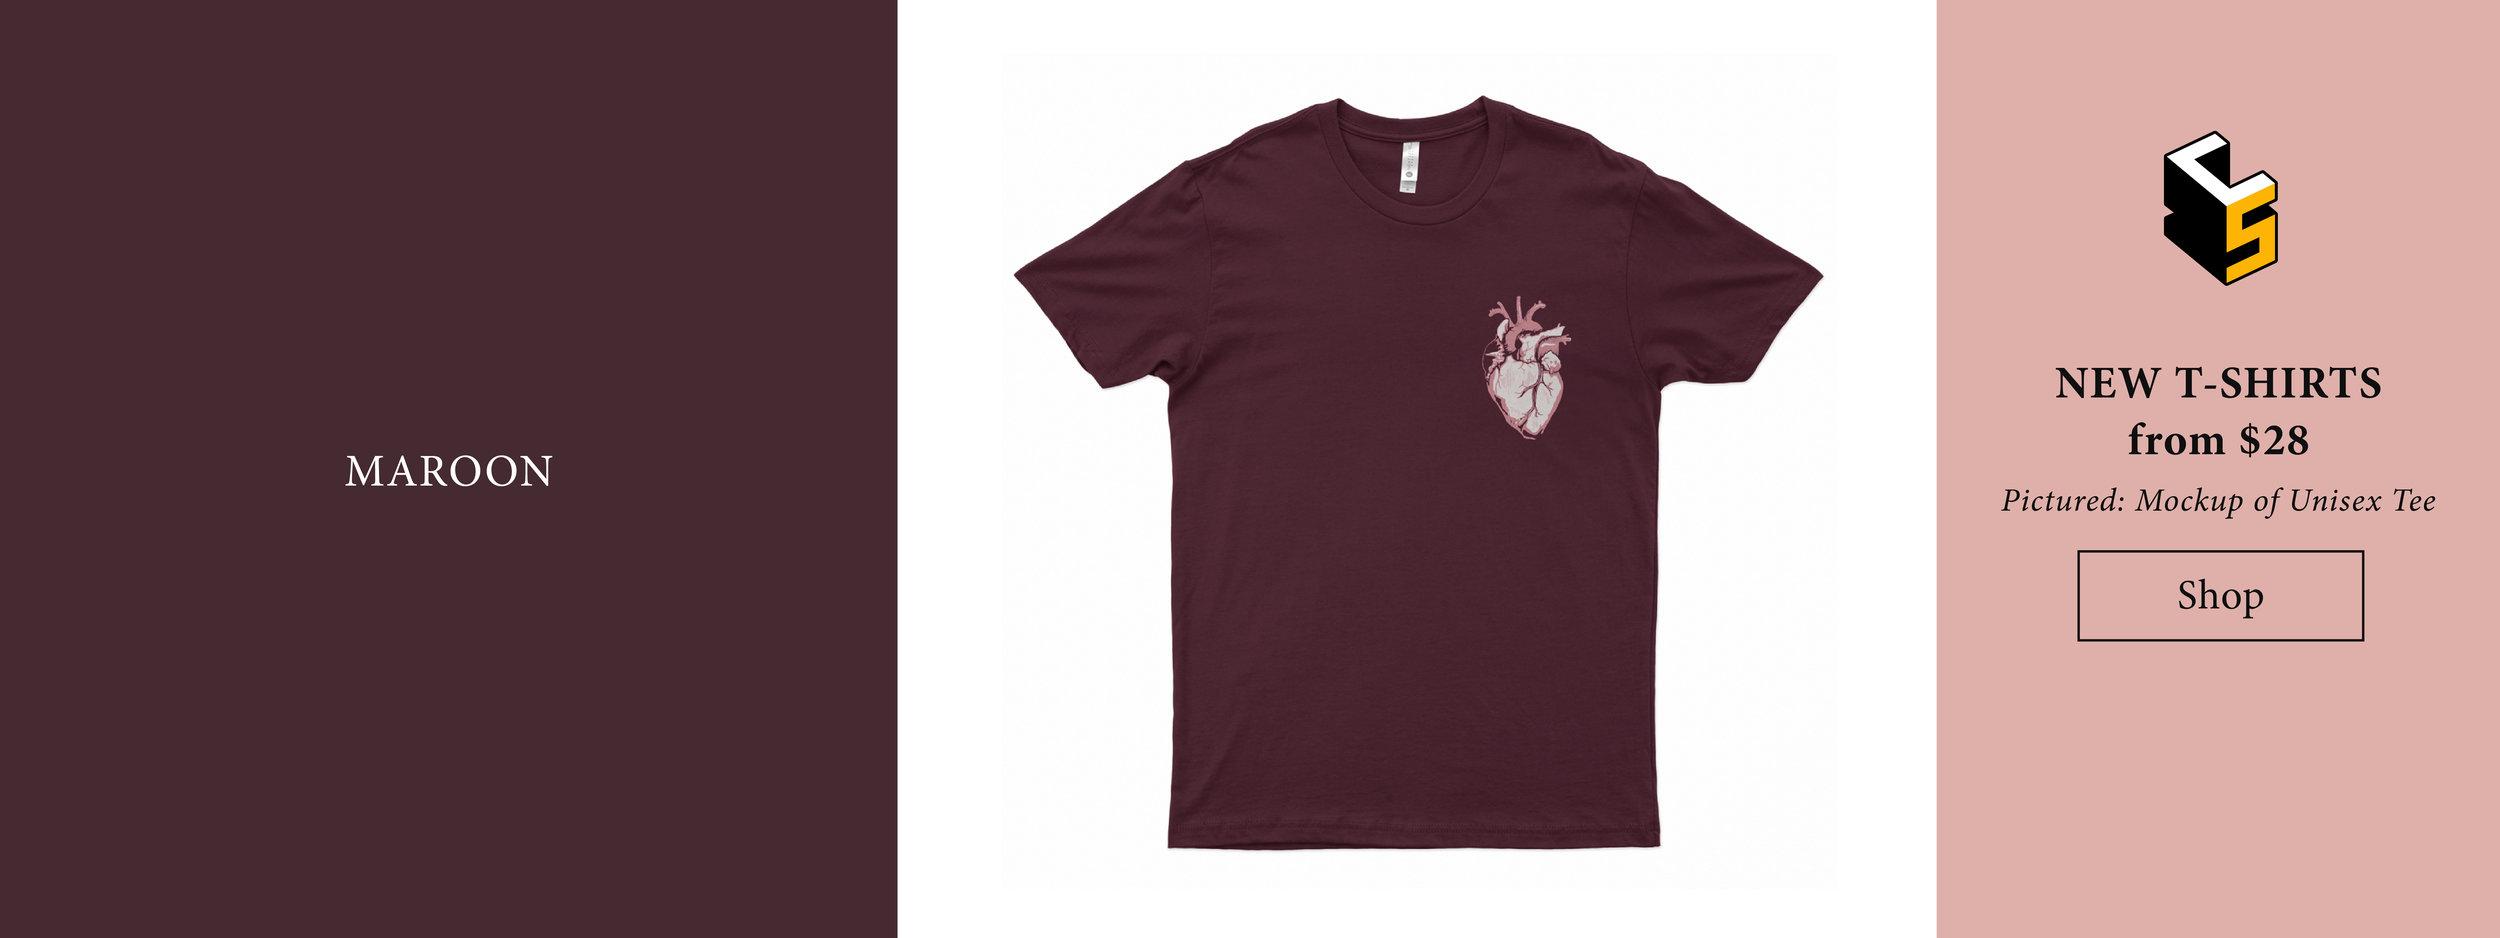 the heart tshirts, the heart teeshirt, the heart tshirt, the heart t-shirt, the heart merch, the heart merchandise, the heart shop, the heart online shop, chopshop, the heart chopshop